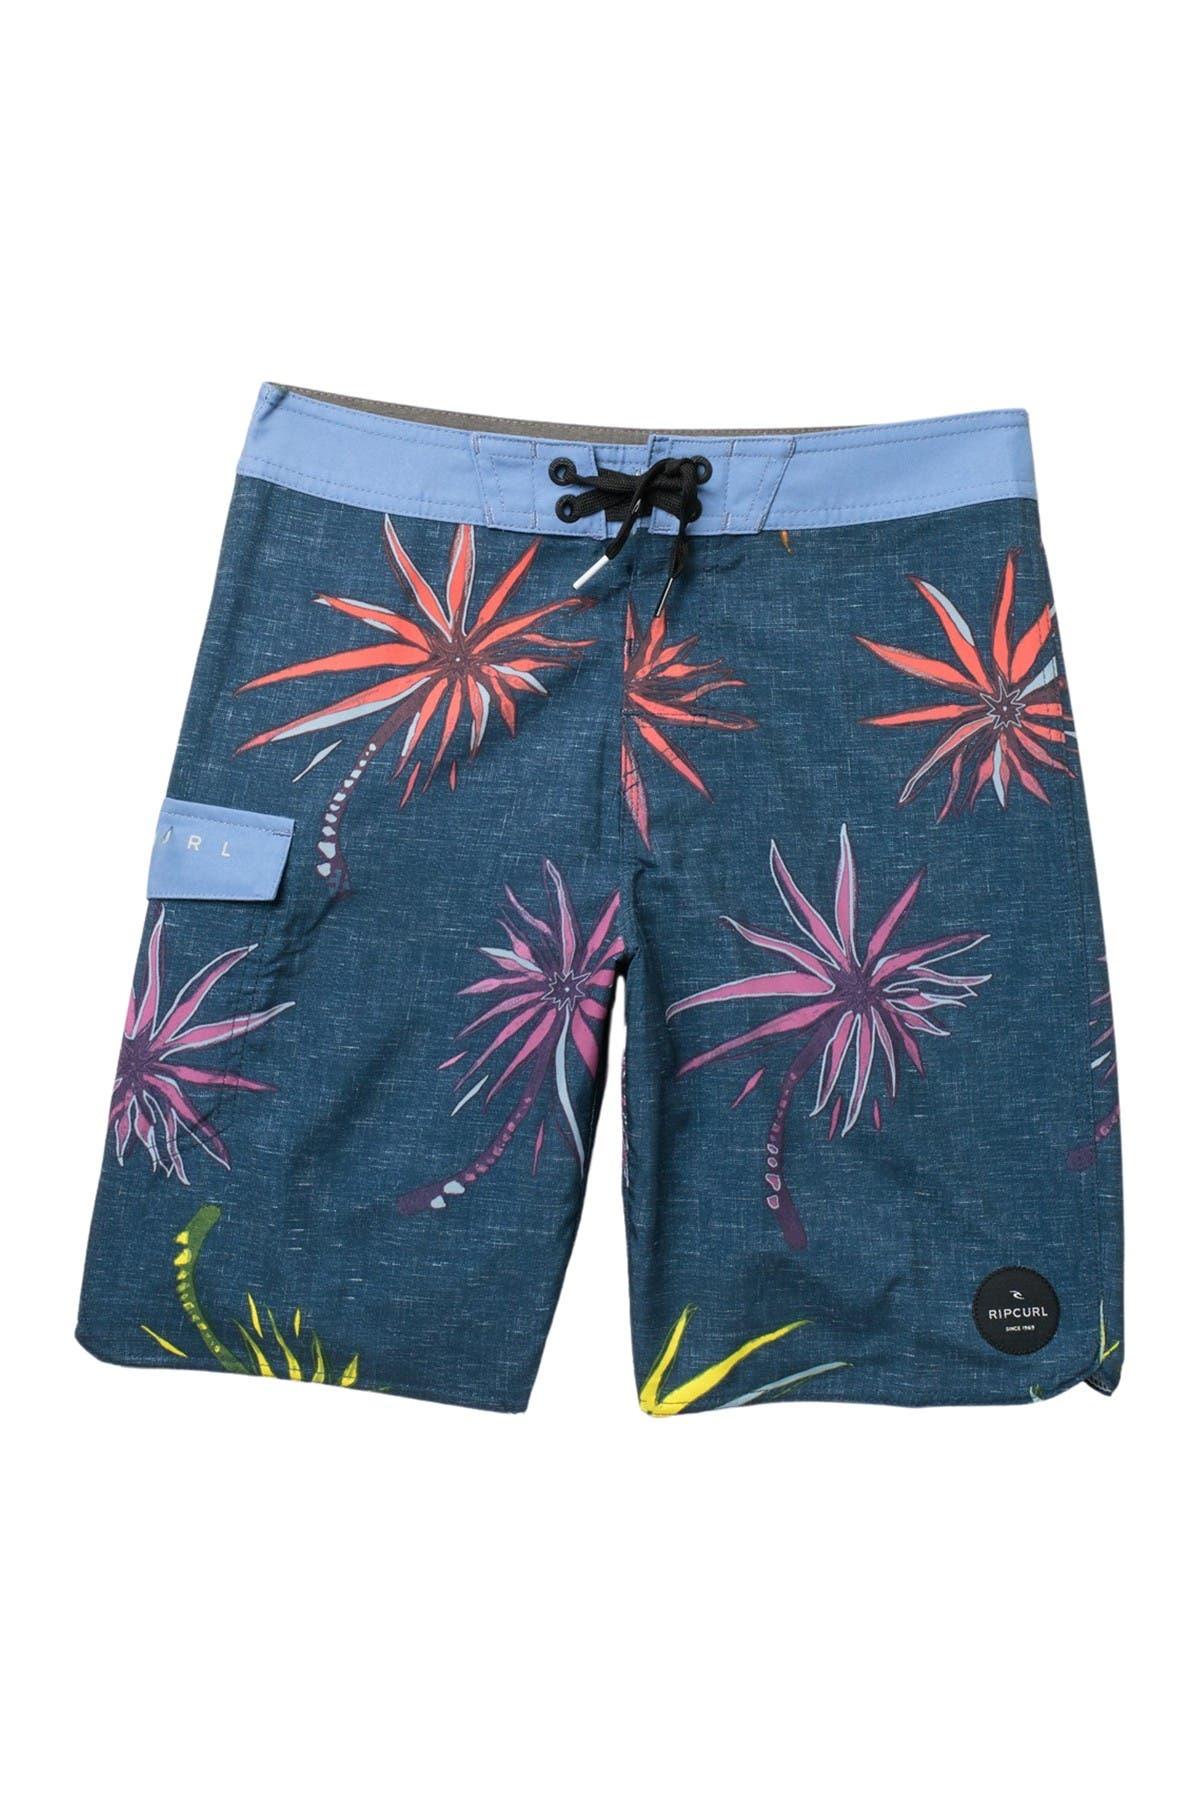 Image of Rip Curl Sweaty Palms Board Shorts